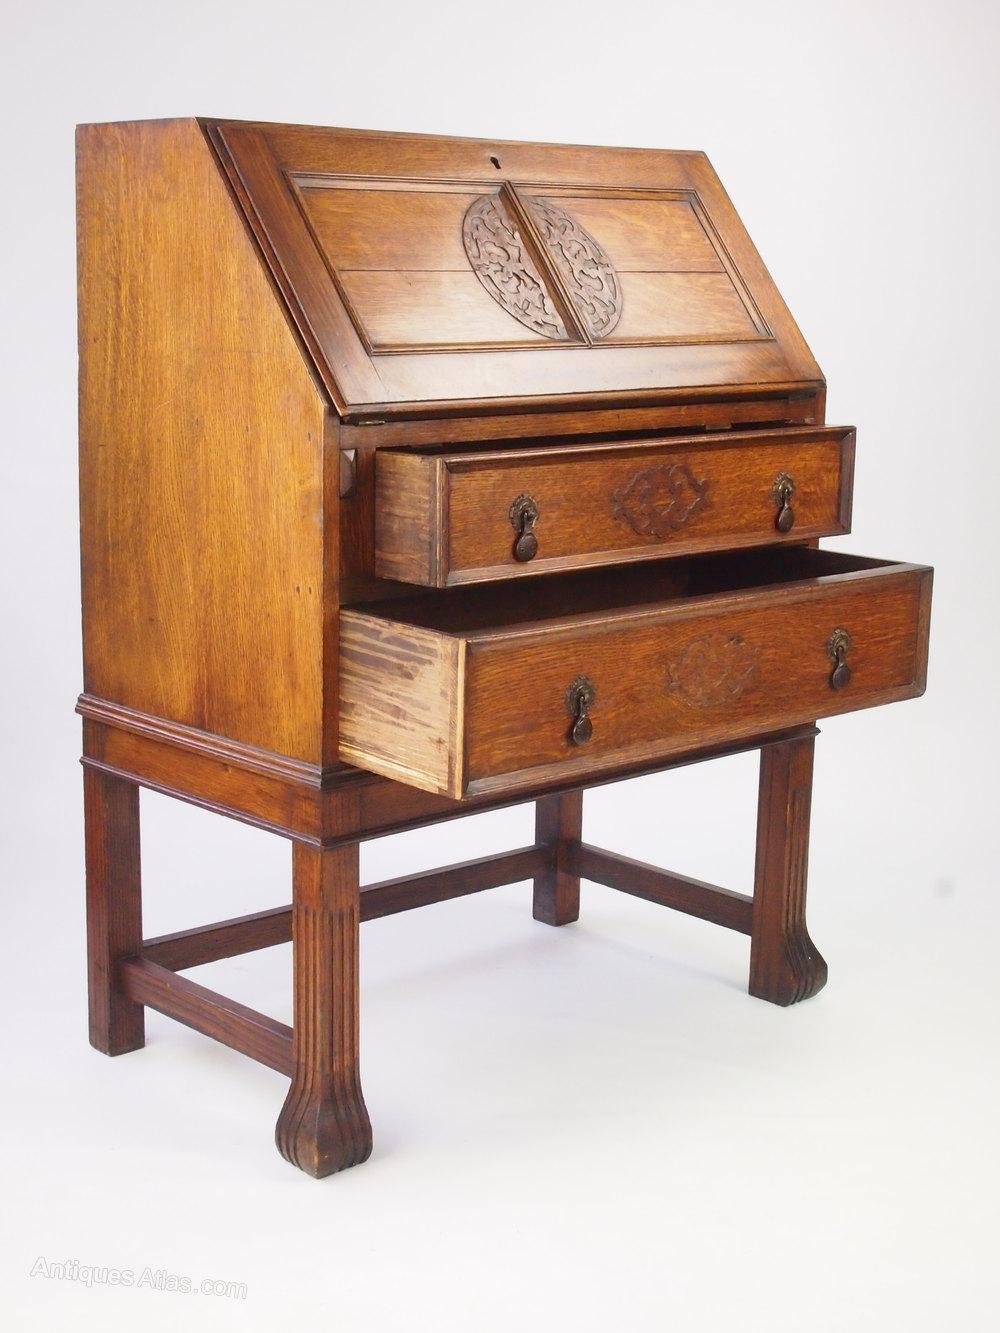 Vintage Oak Bureau Hall Bureau Writing Desk Antiques Atlas